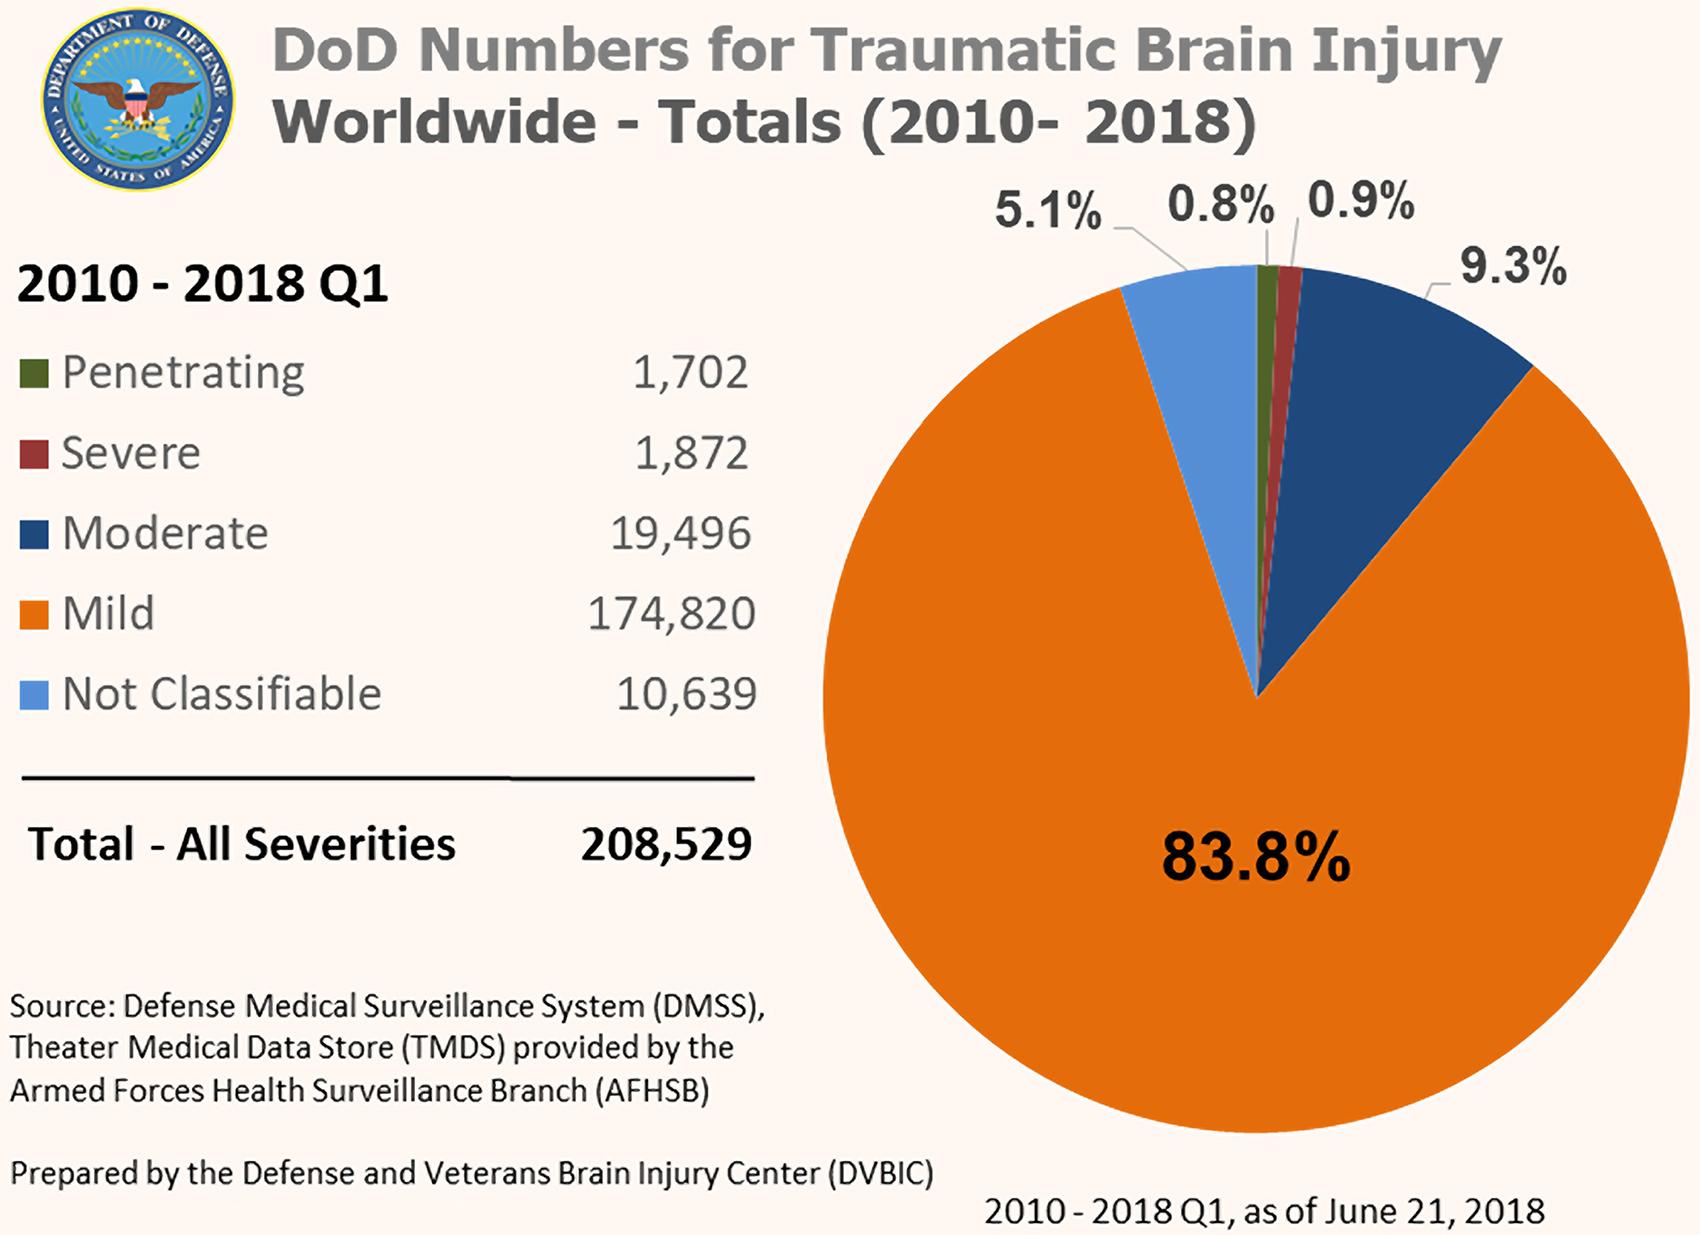 Continuum of the United States military's traumatic brain injury